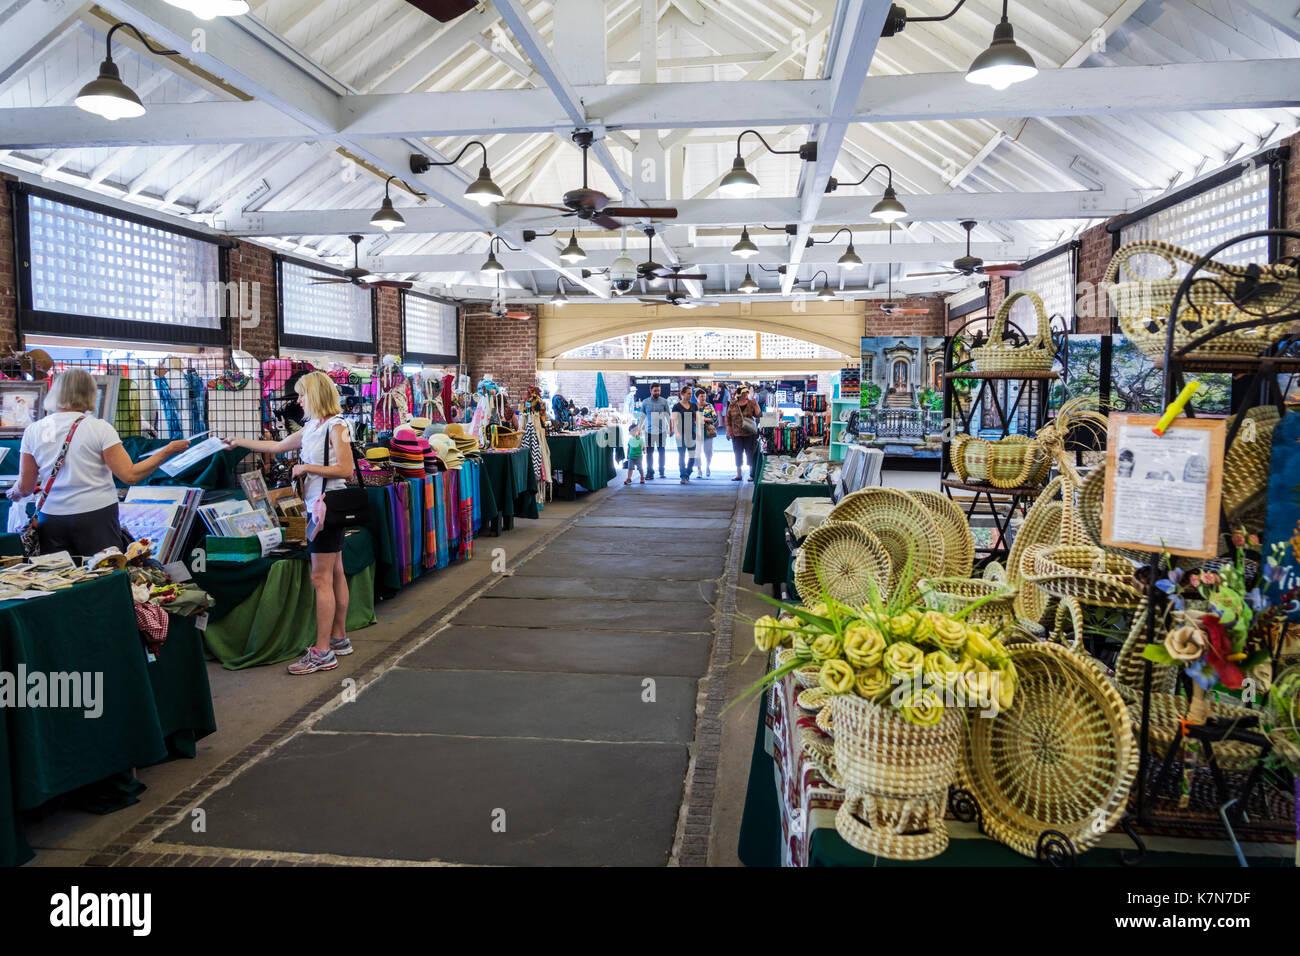 Charleston South Carolina SC Historic Downtown Charleston City Market shopping vendors stalls - Stock Image